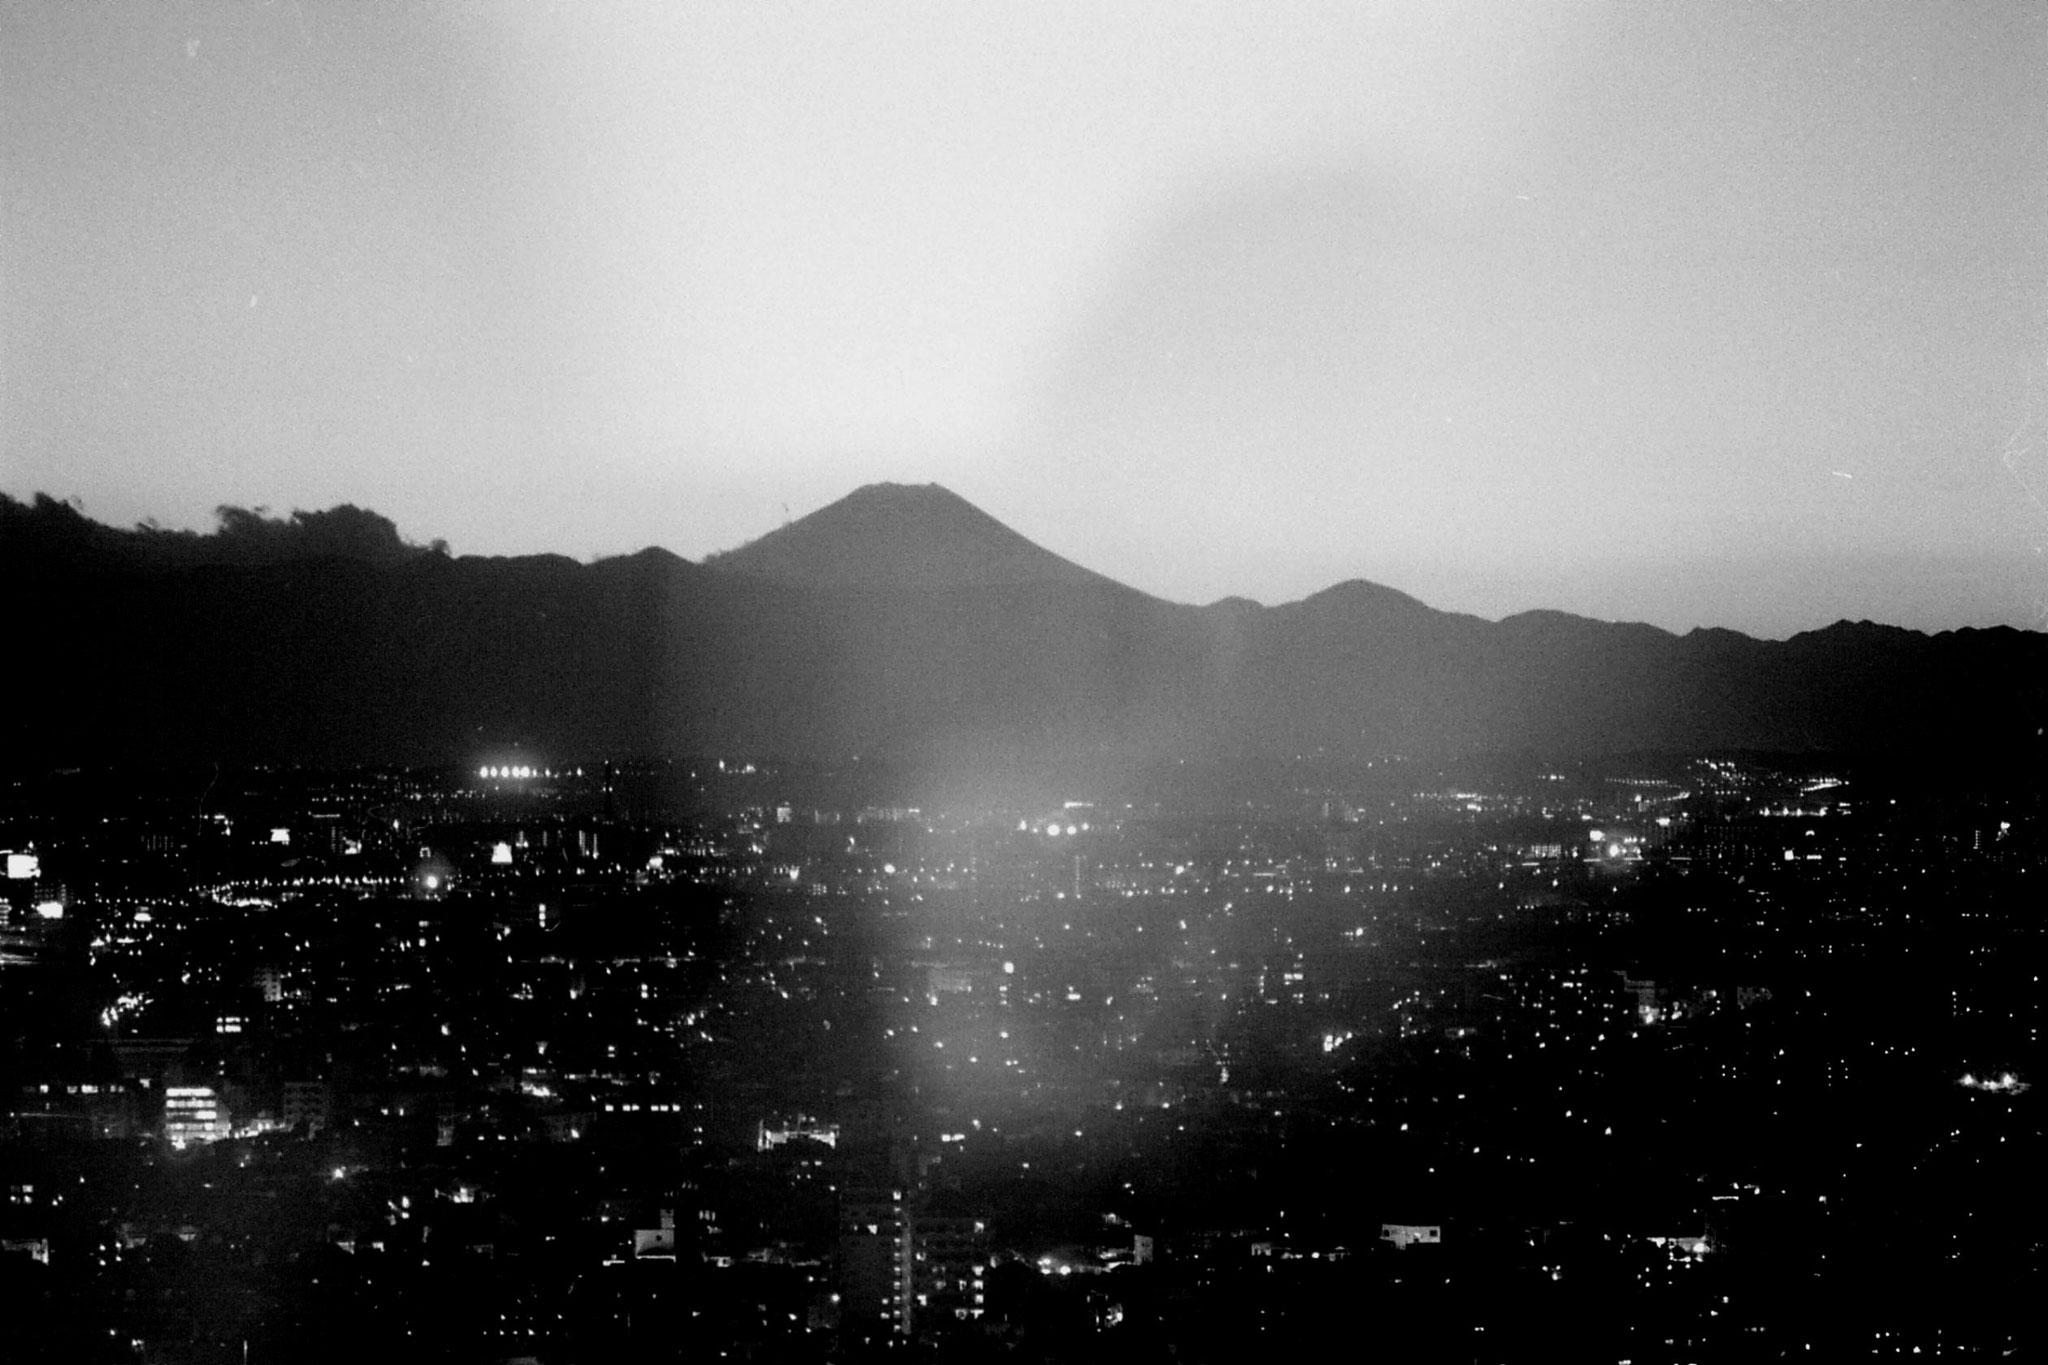 28/12/1988: 26: Mt Fuji from Tokyo